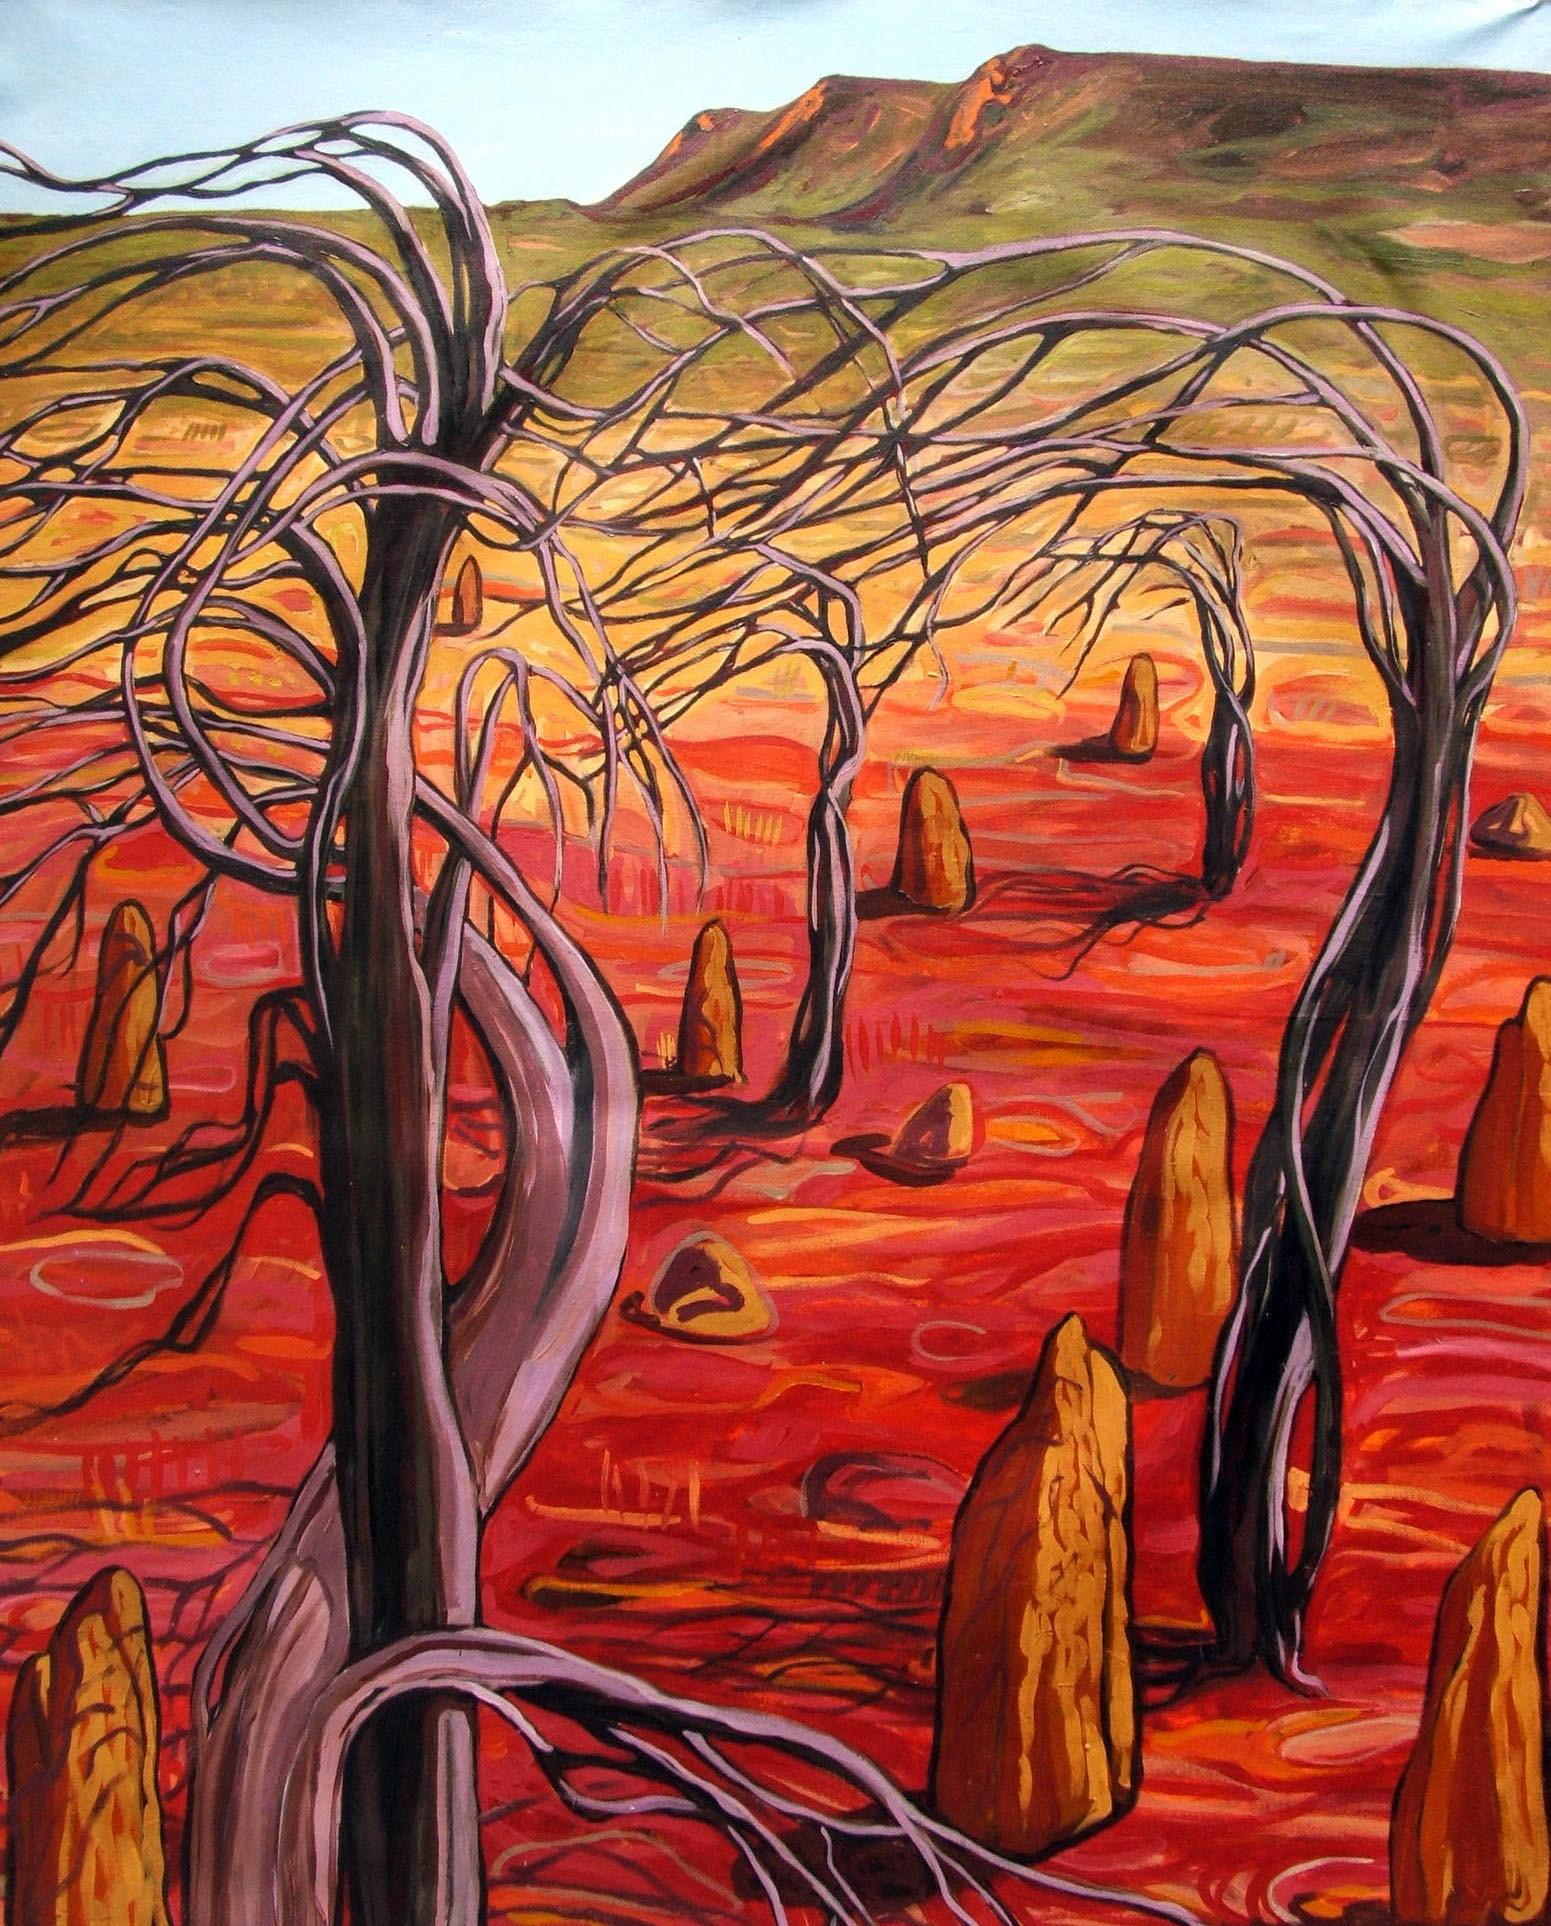 prayer-trees-at-davenport-rangesoil-on-canvas140cm-x-90cm-001